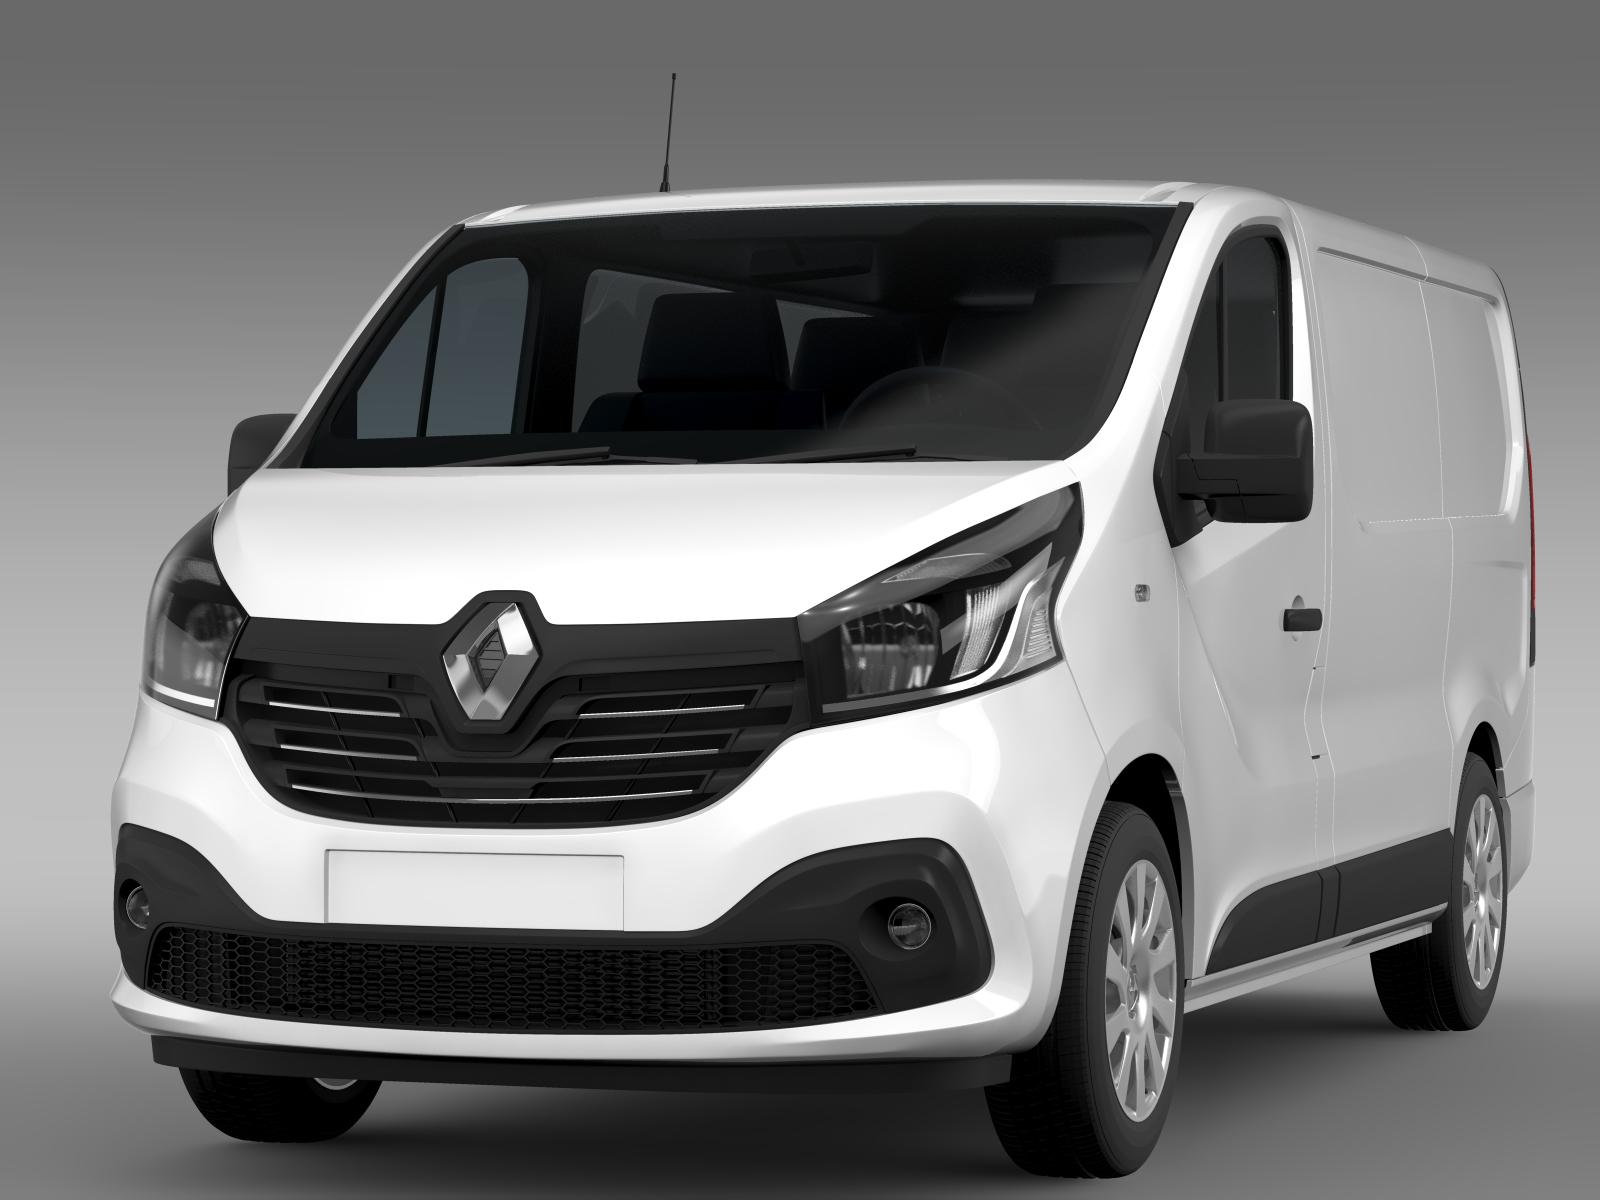 Renault Trafic Van 2015 3D Model  Renault Trafic ...